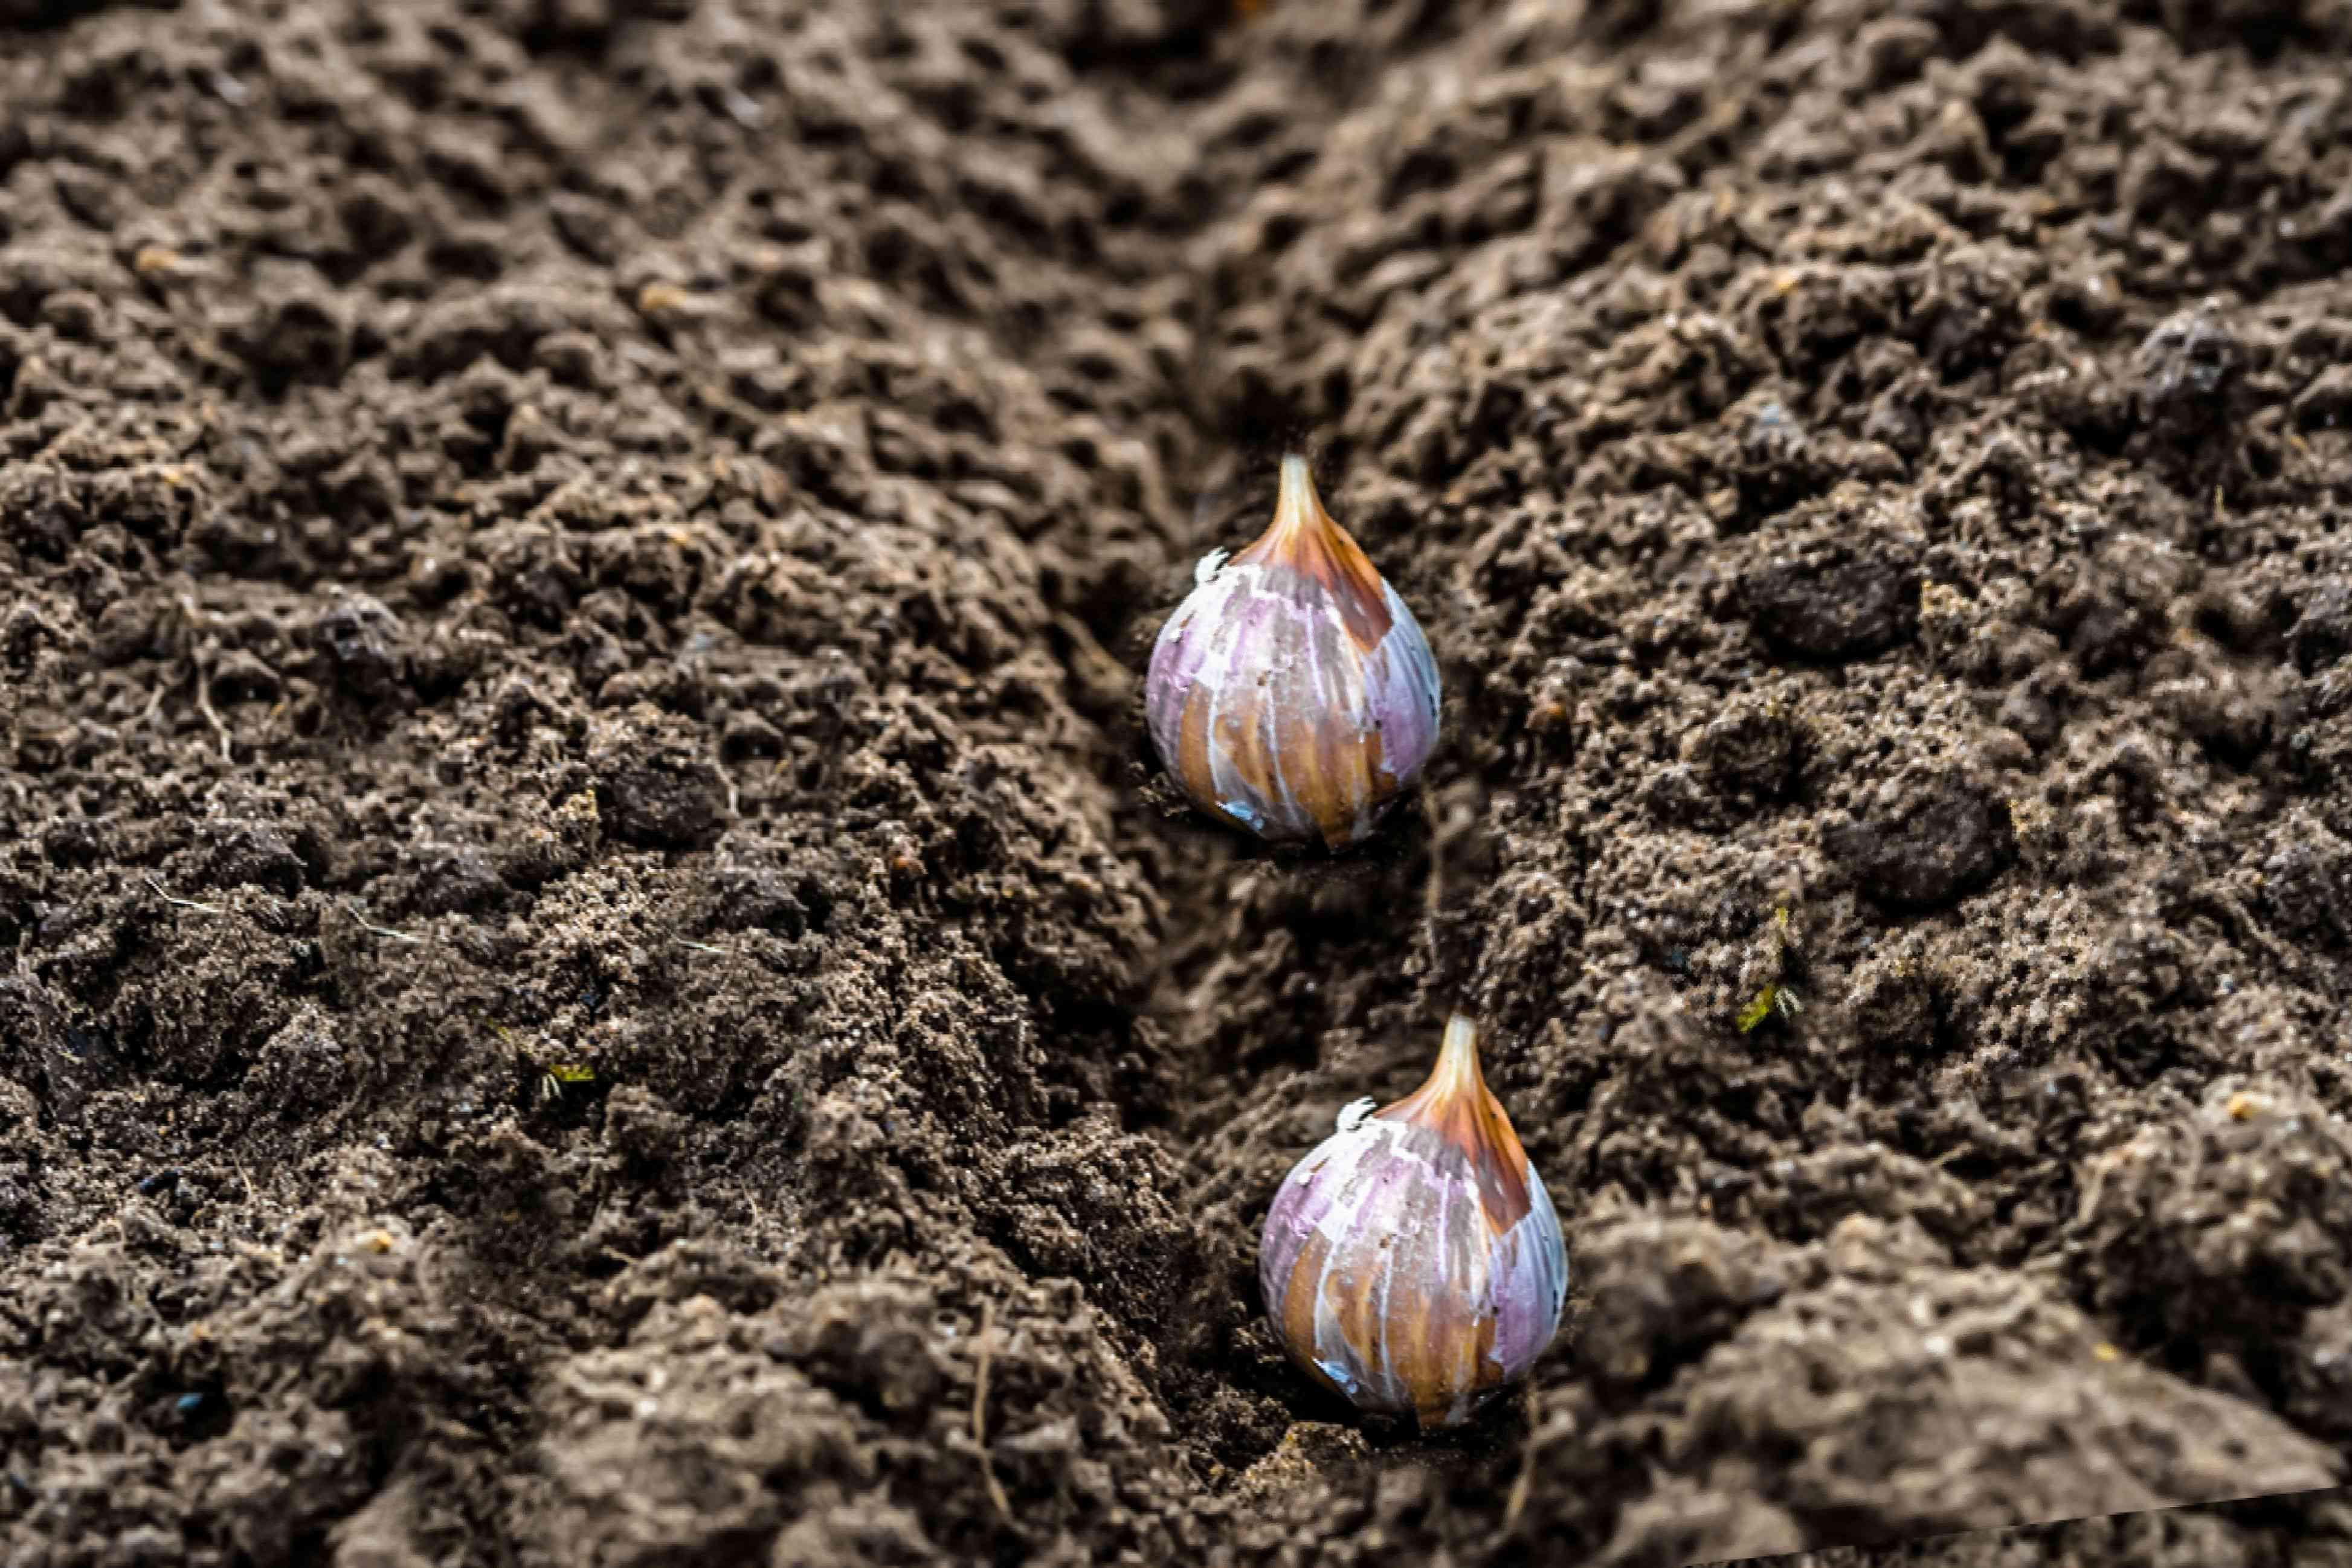 garlic cloves in the soil